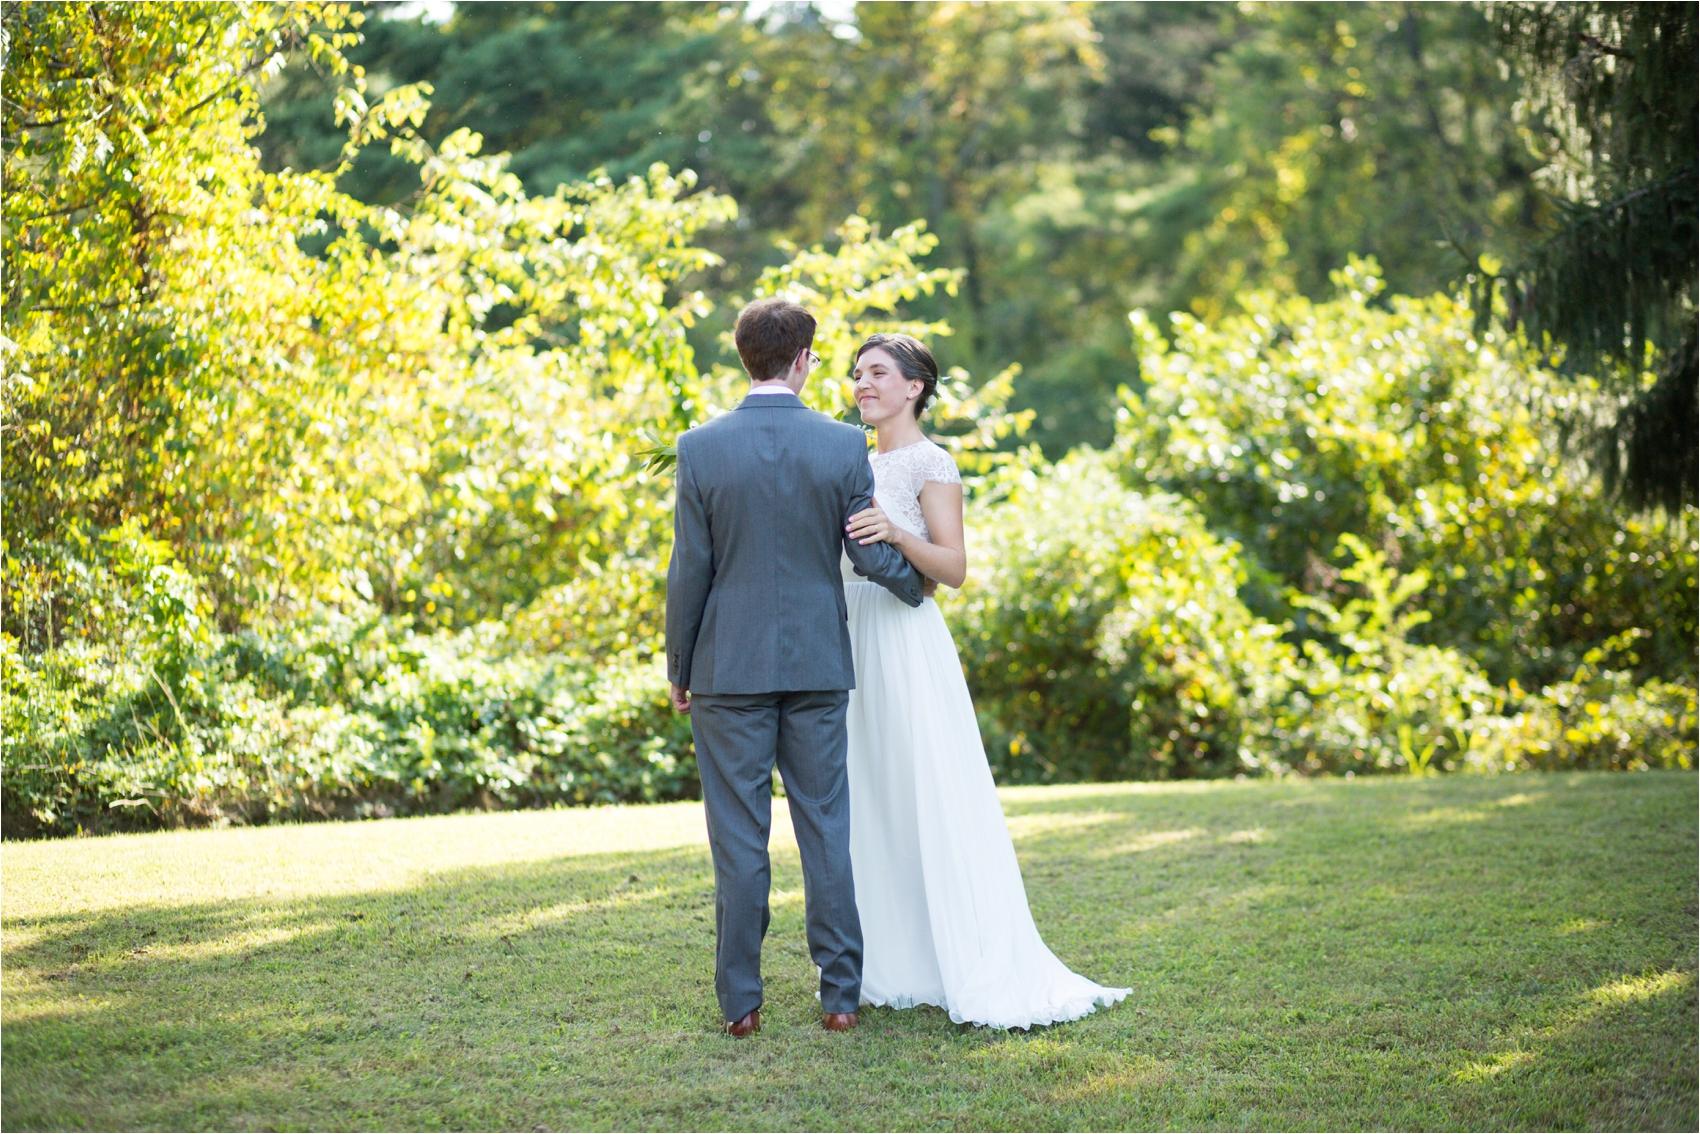 Feather-and-Oak-Rainforest-Trust-Virginia-Wedding-0575.jpg